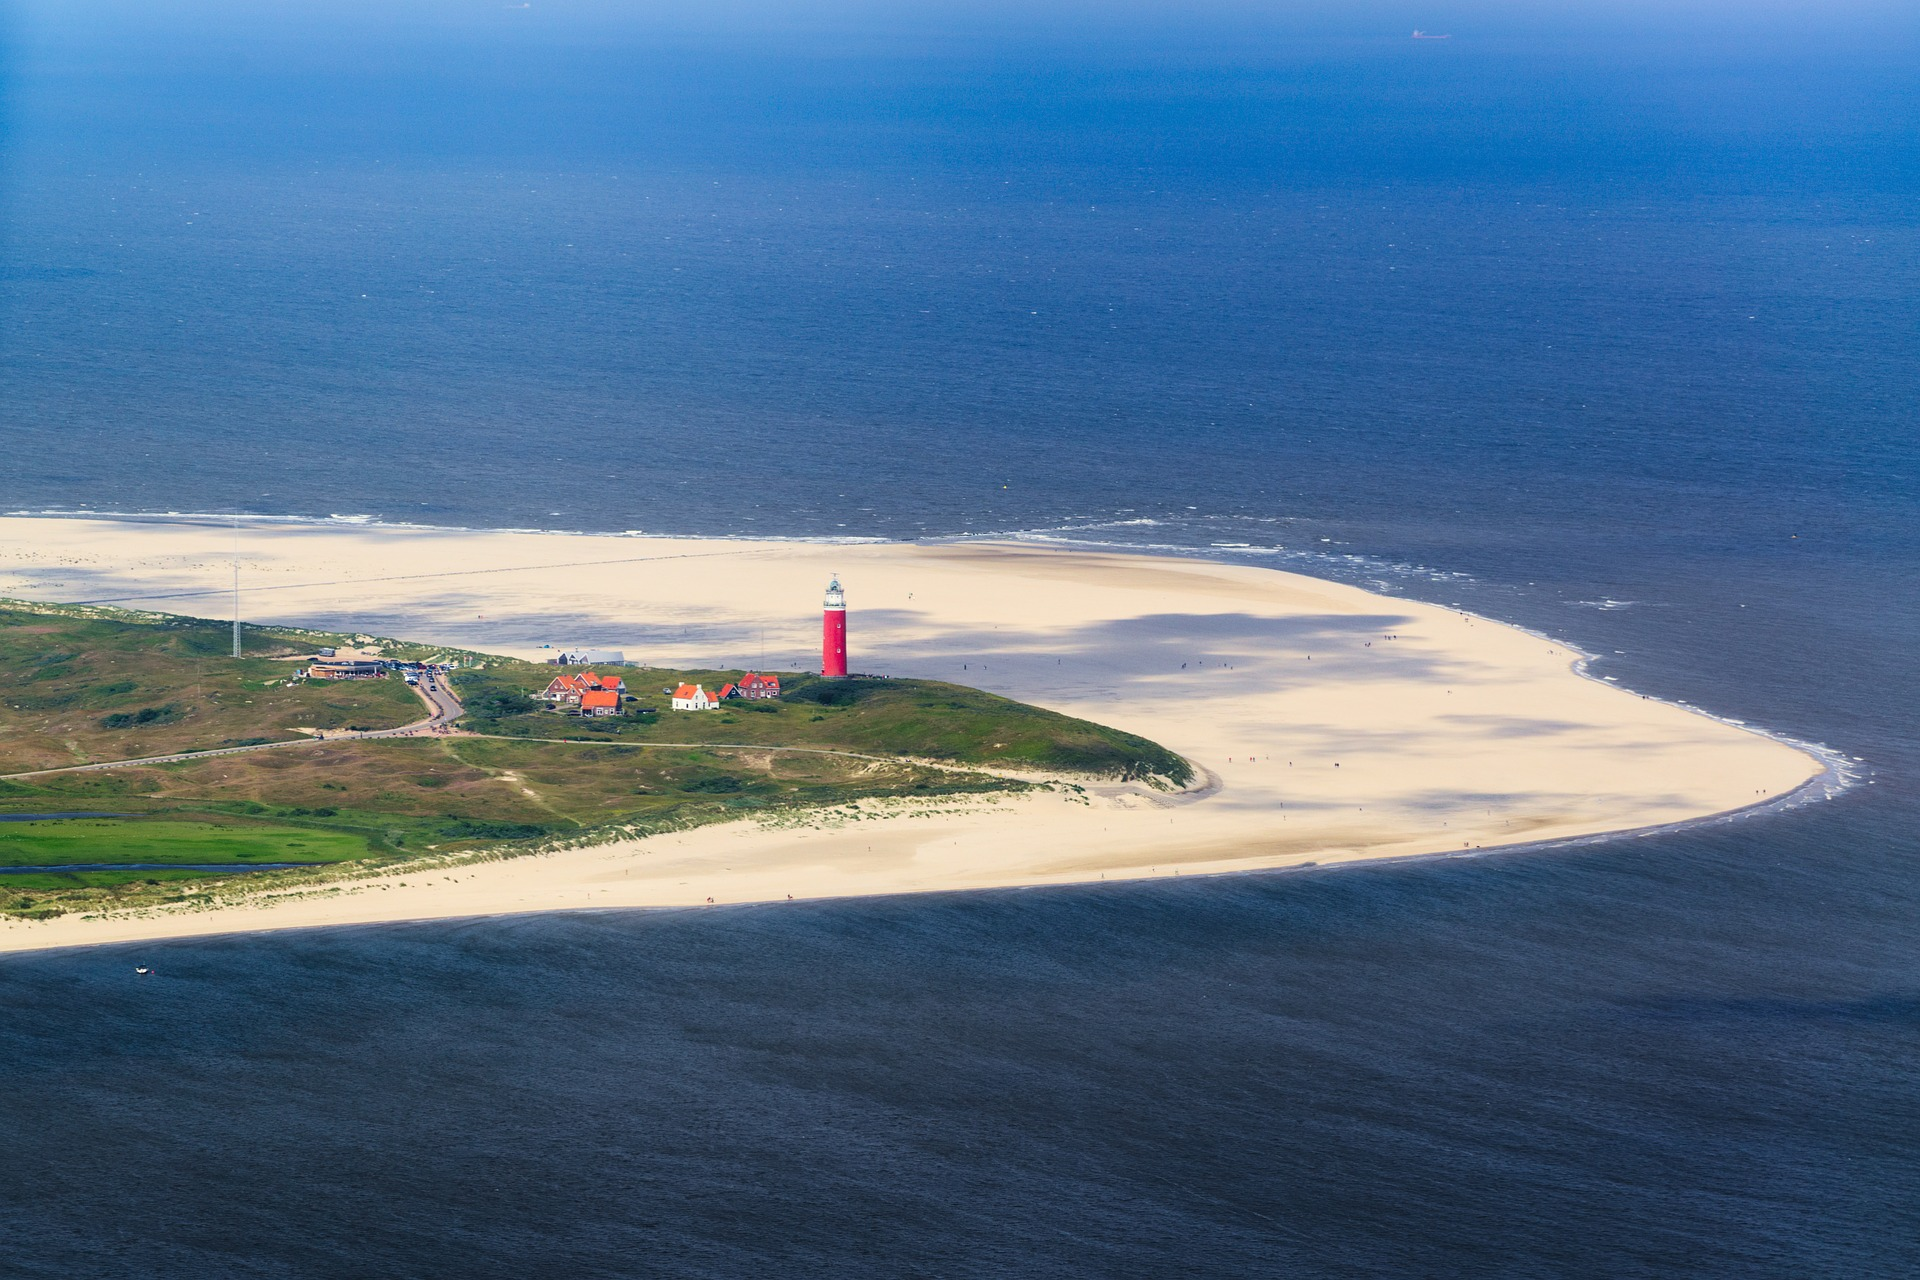 Duhnen Domizil: Urlaub an der Nordsee